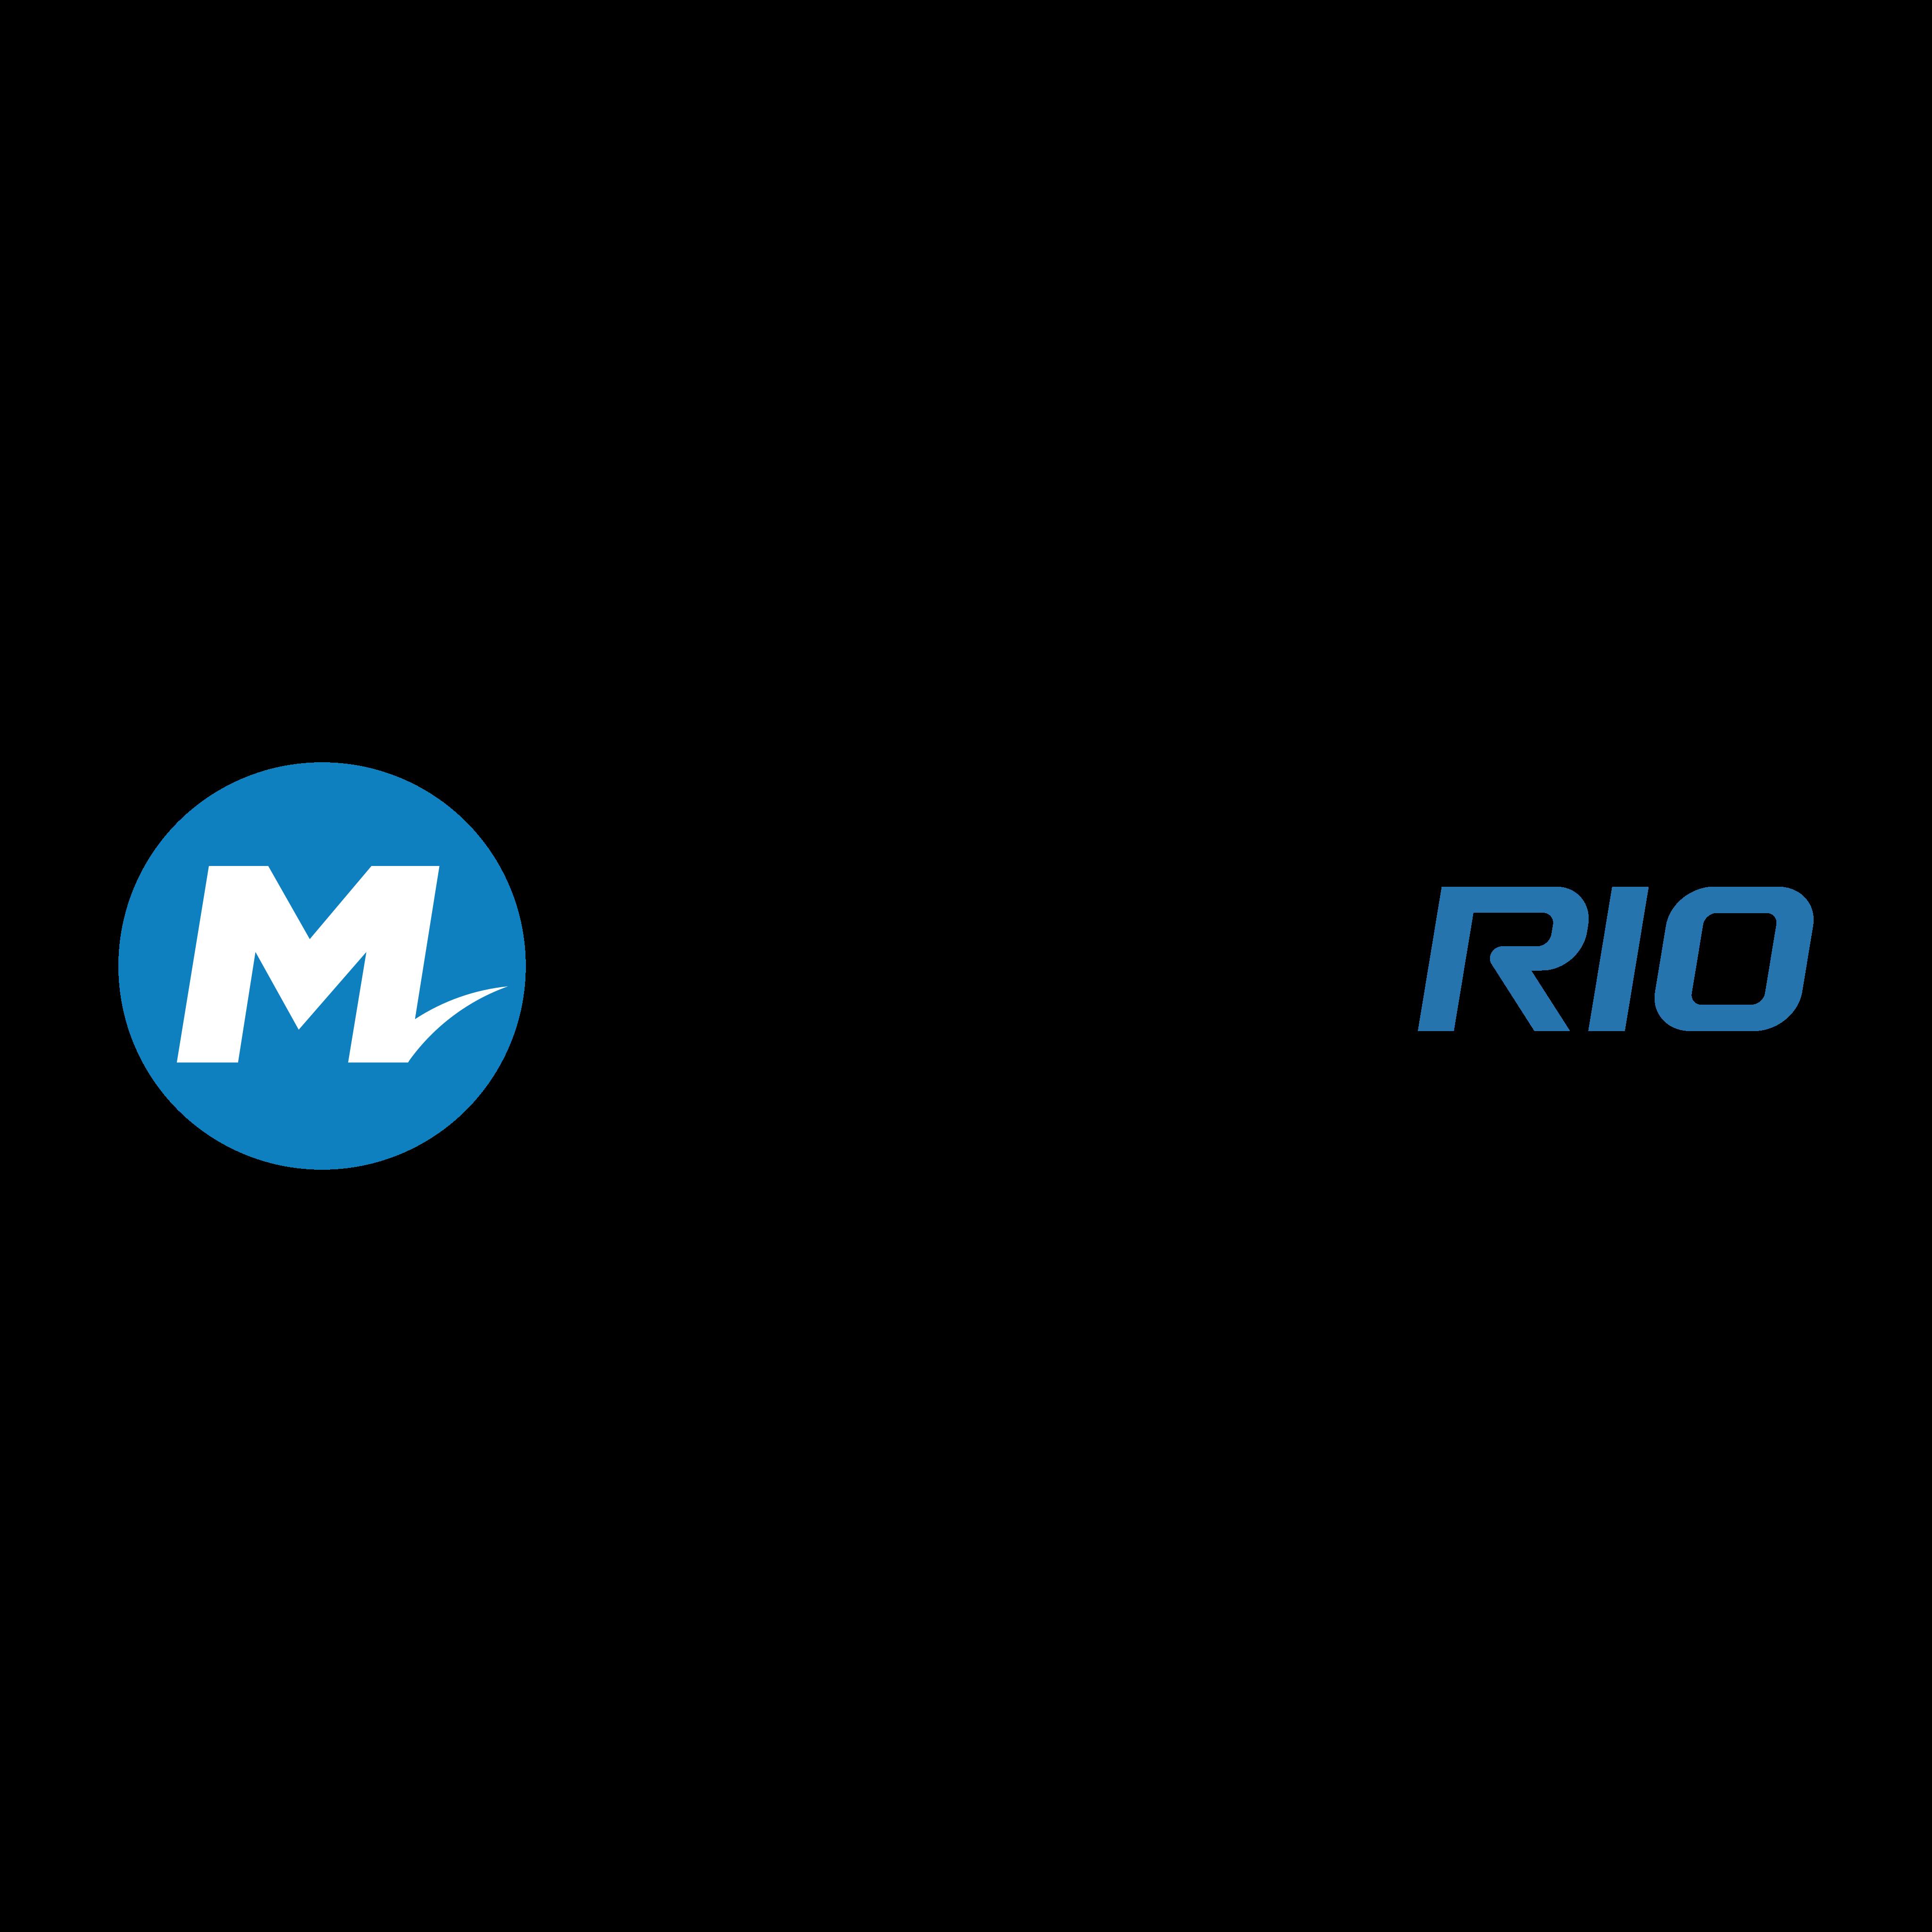 METRO RIO